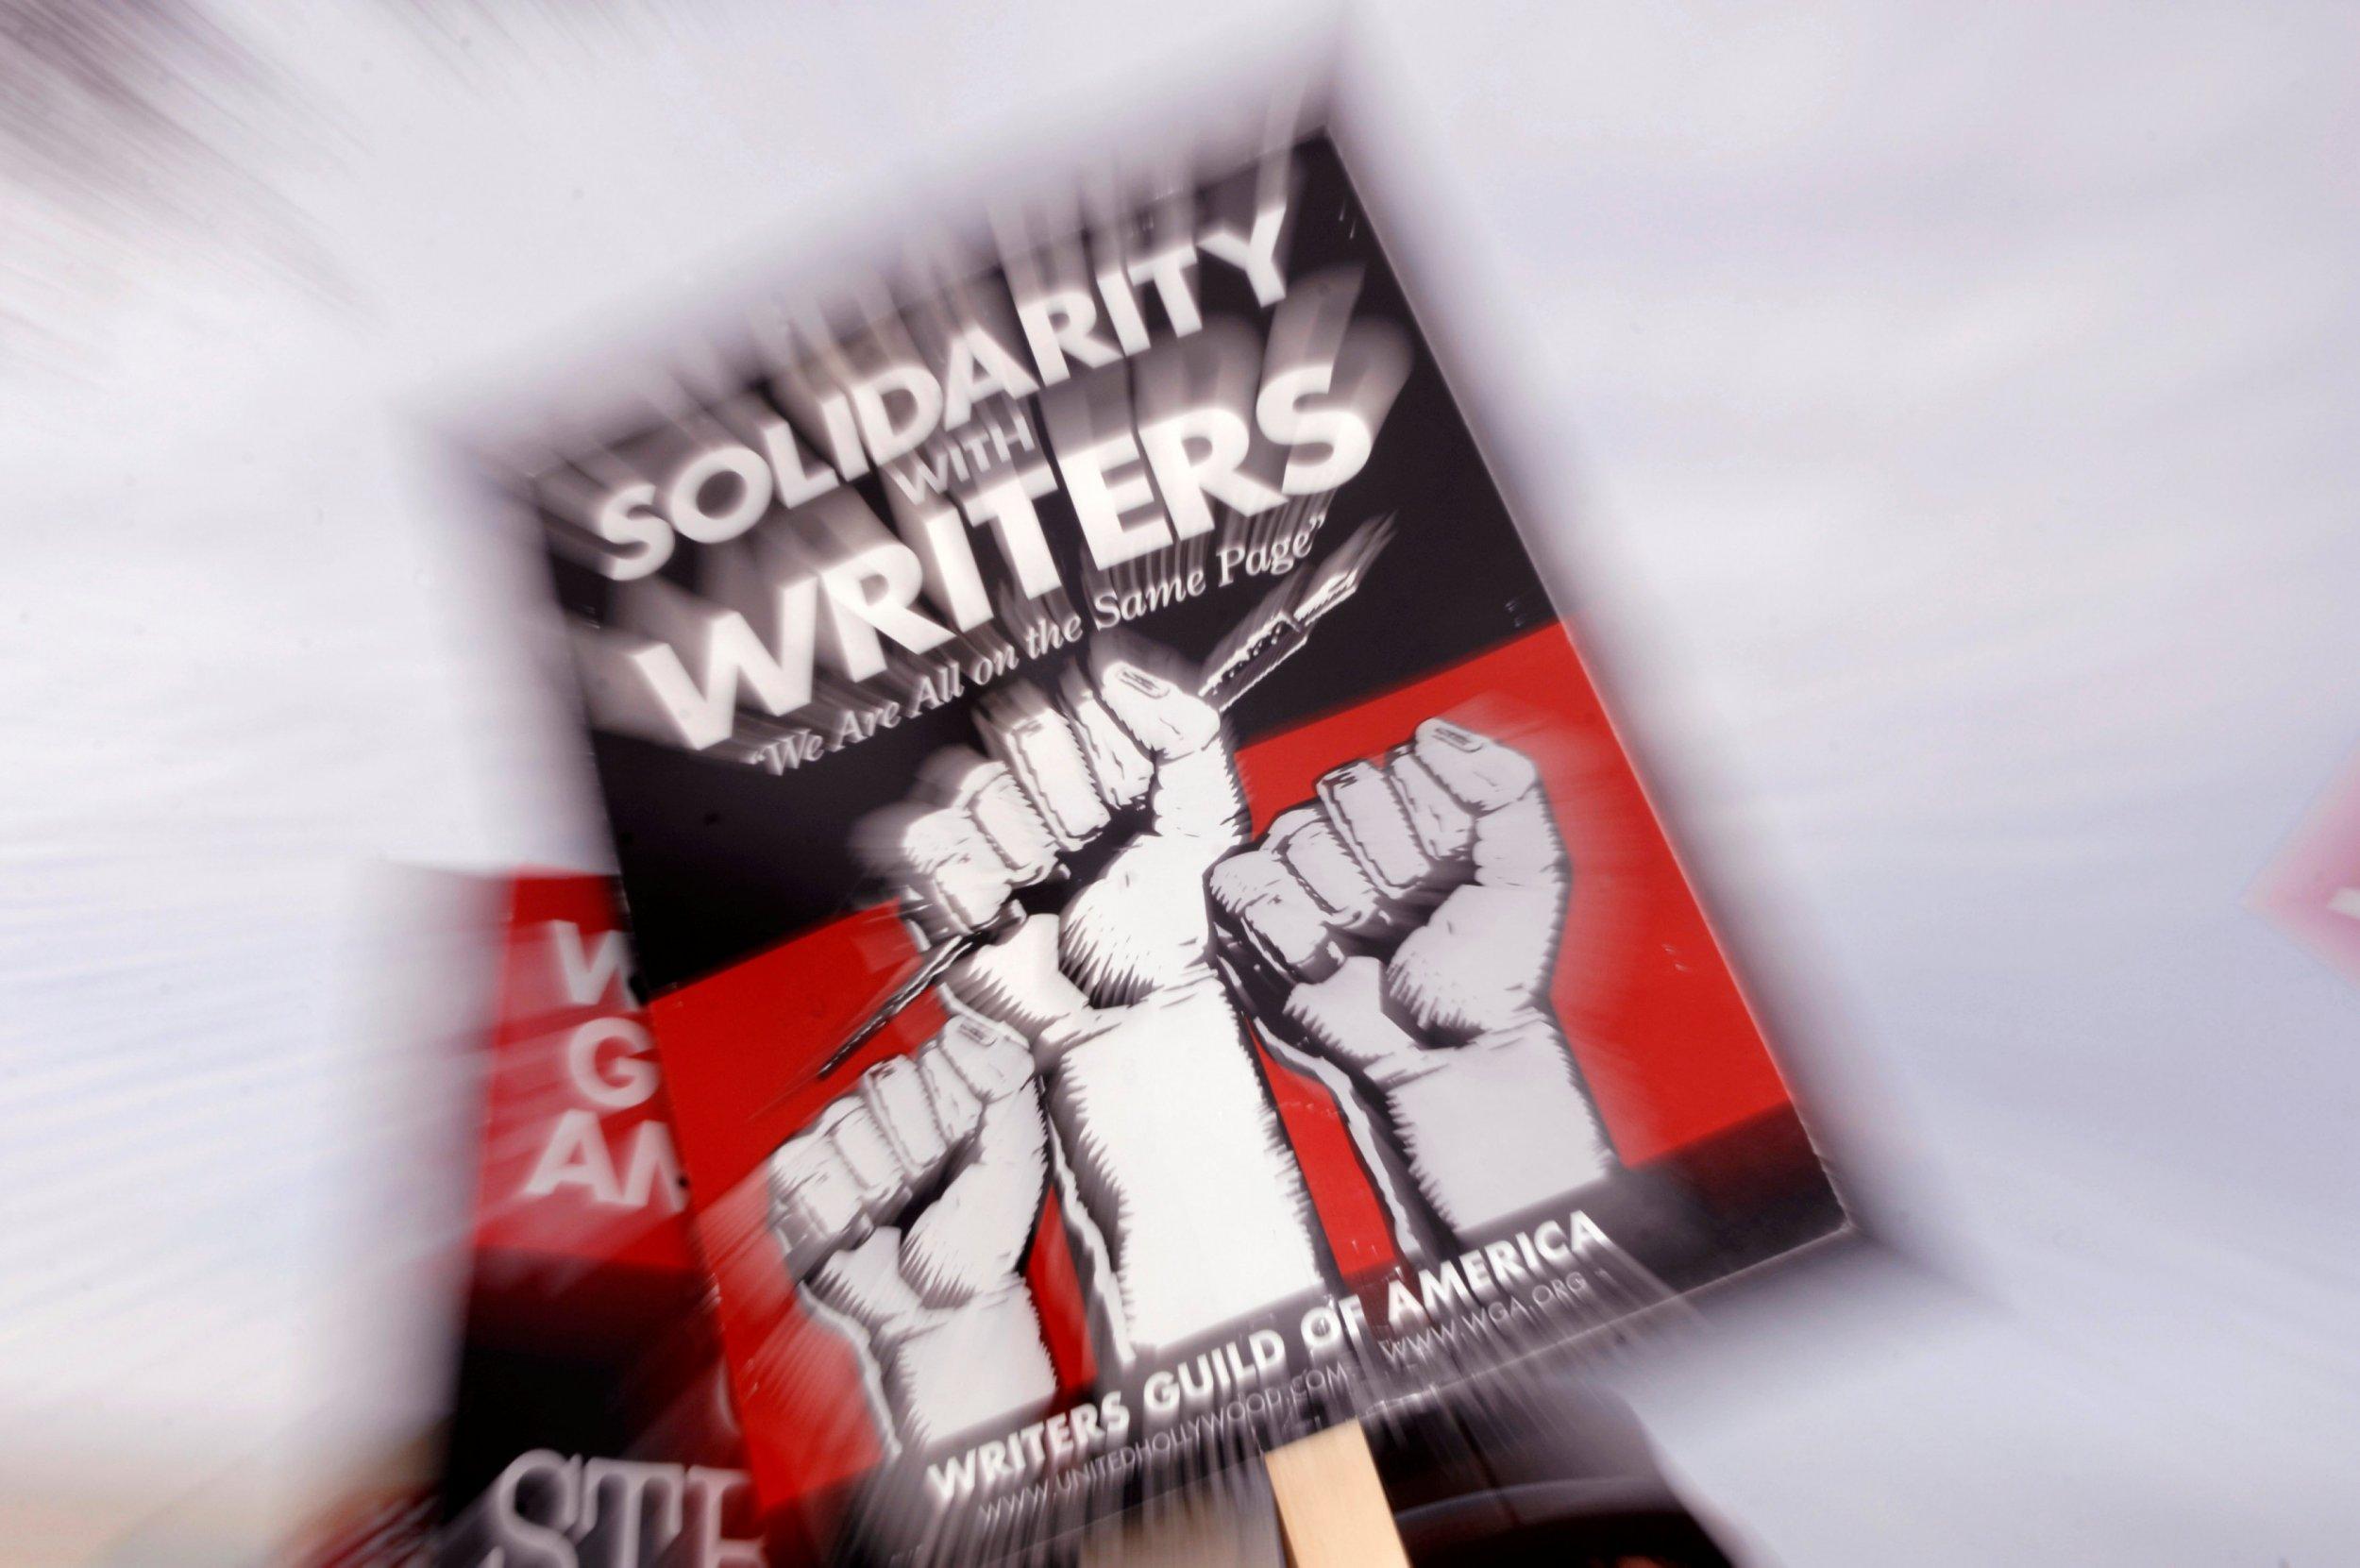 Writers Guild of America strike